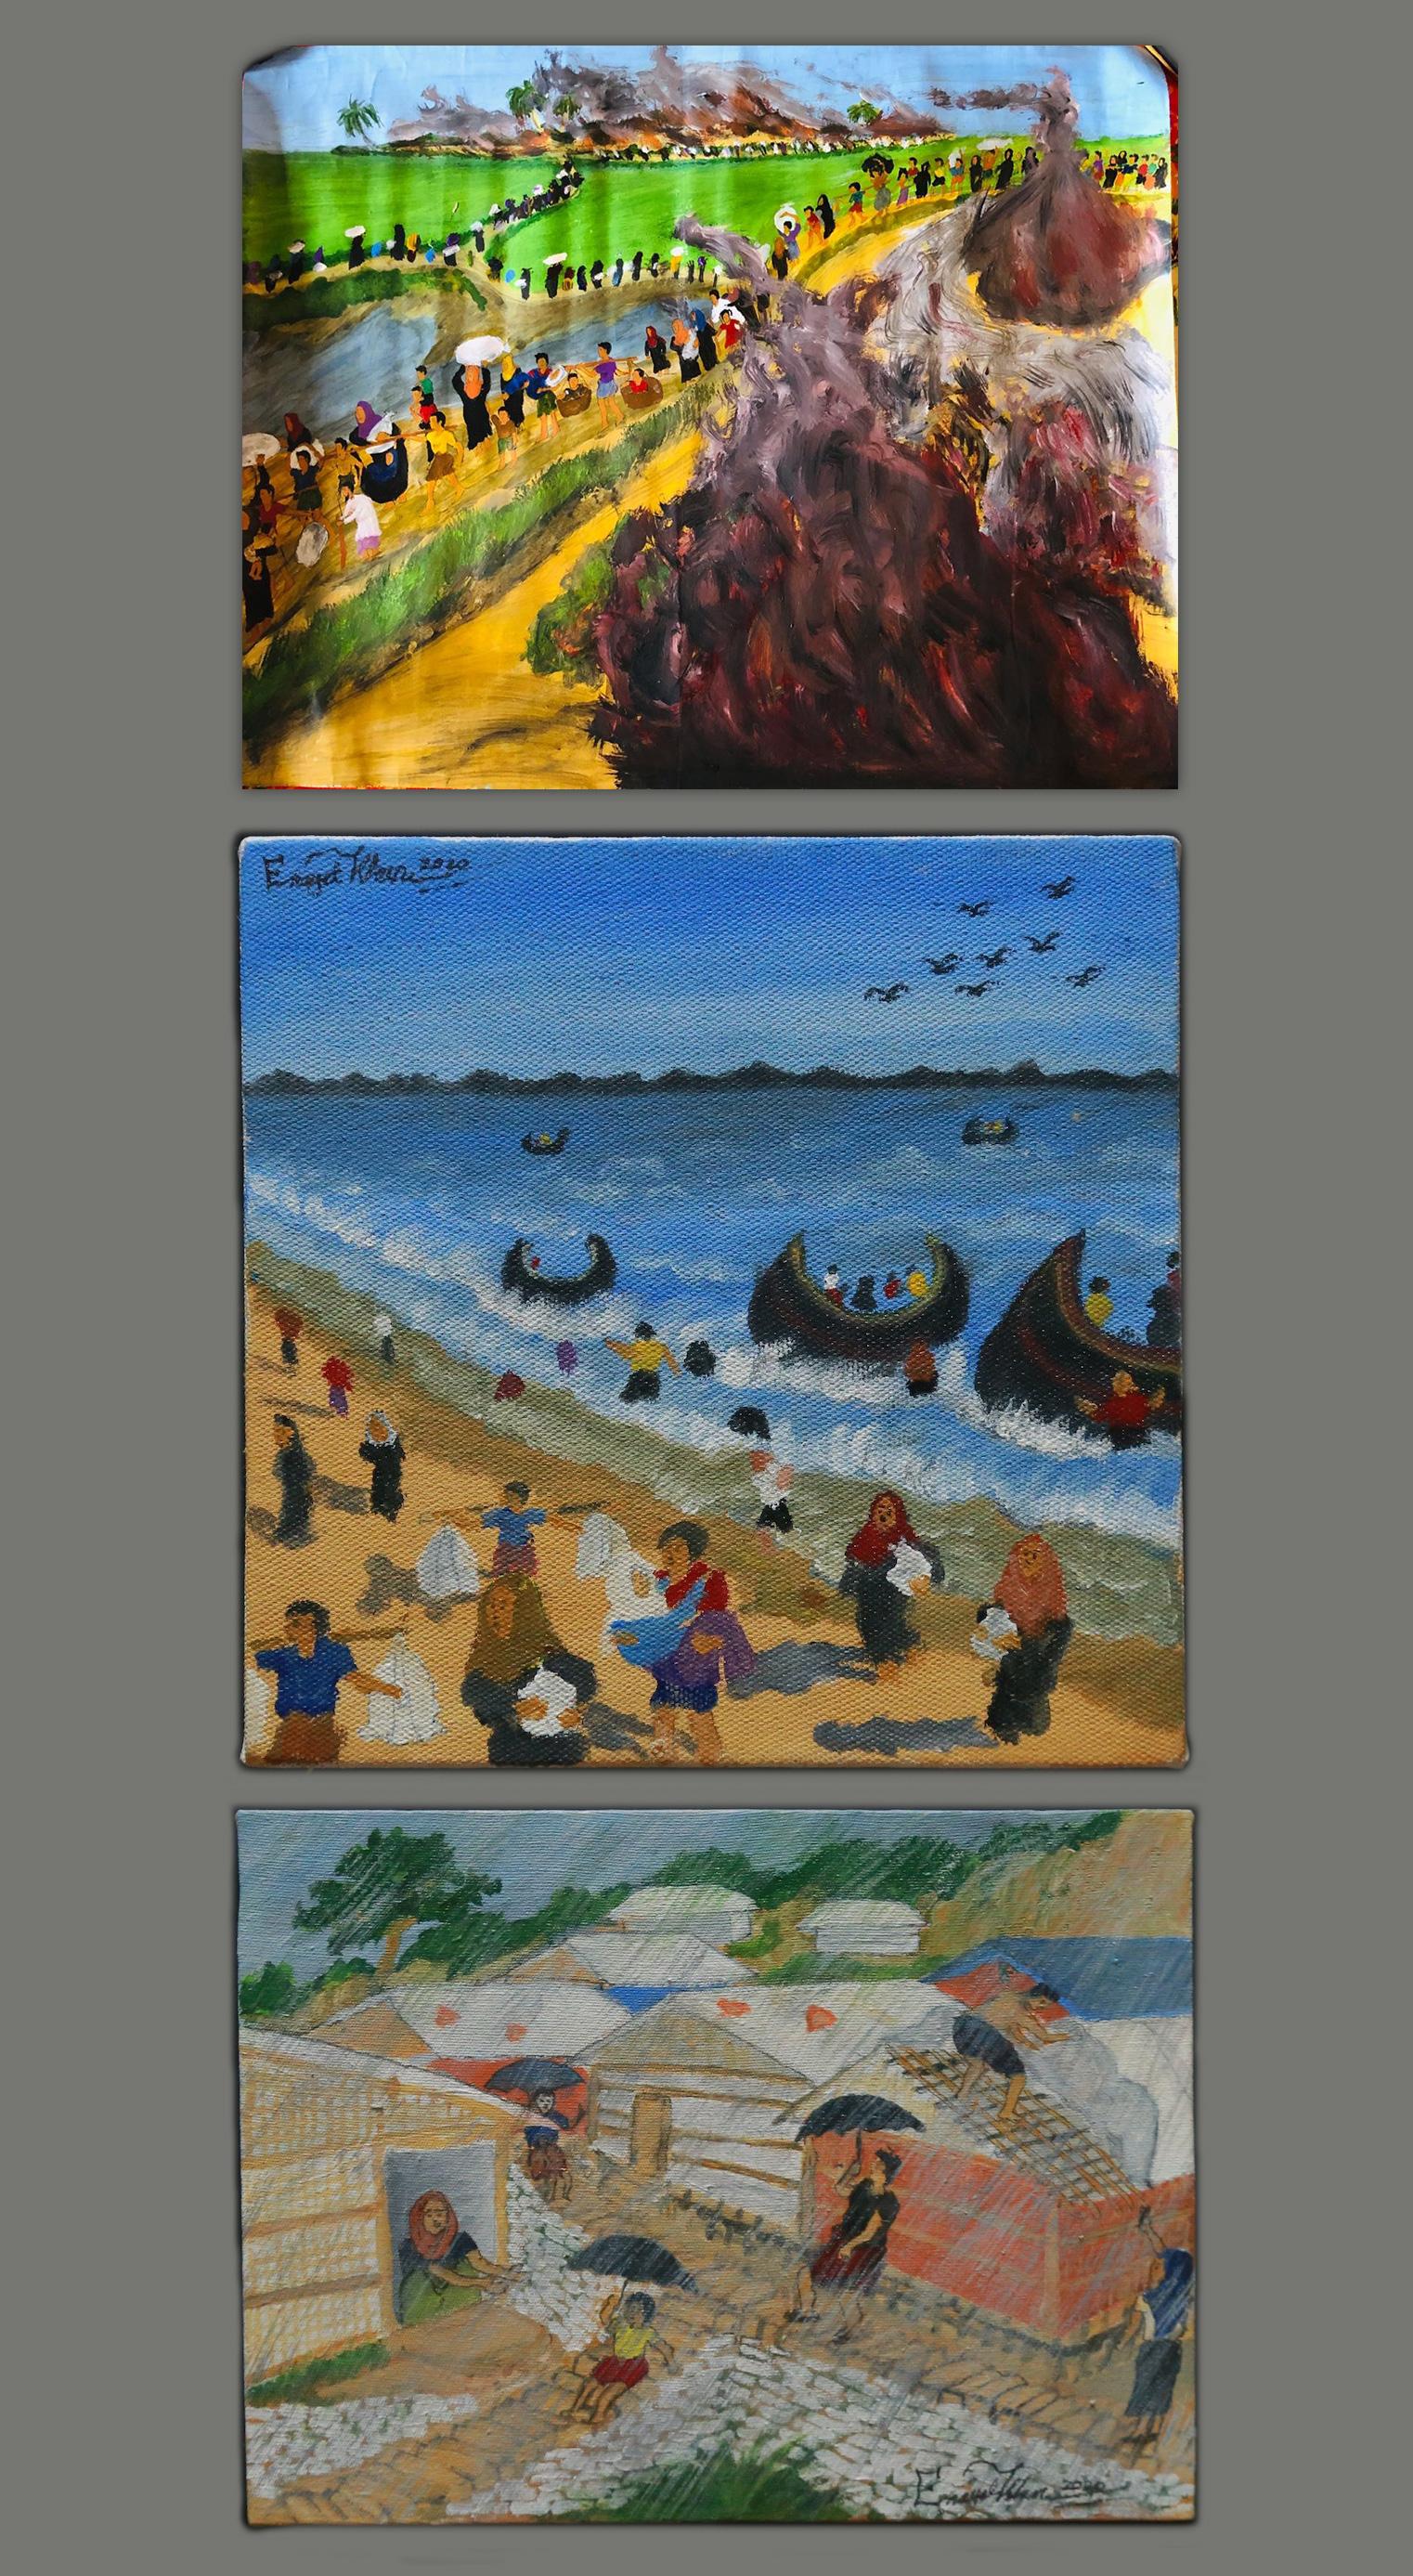 Enayet Khan, Reality of Rohingya (3 paintings)